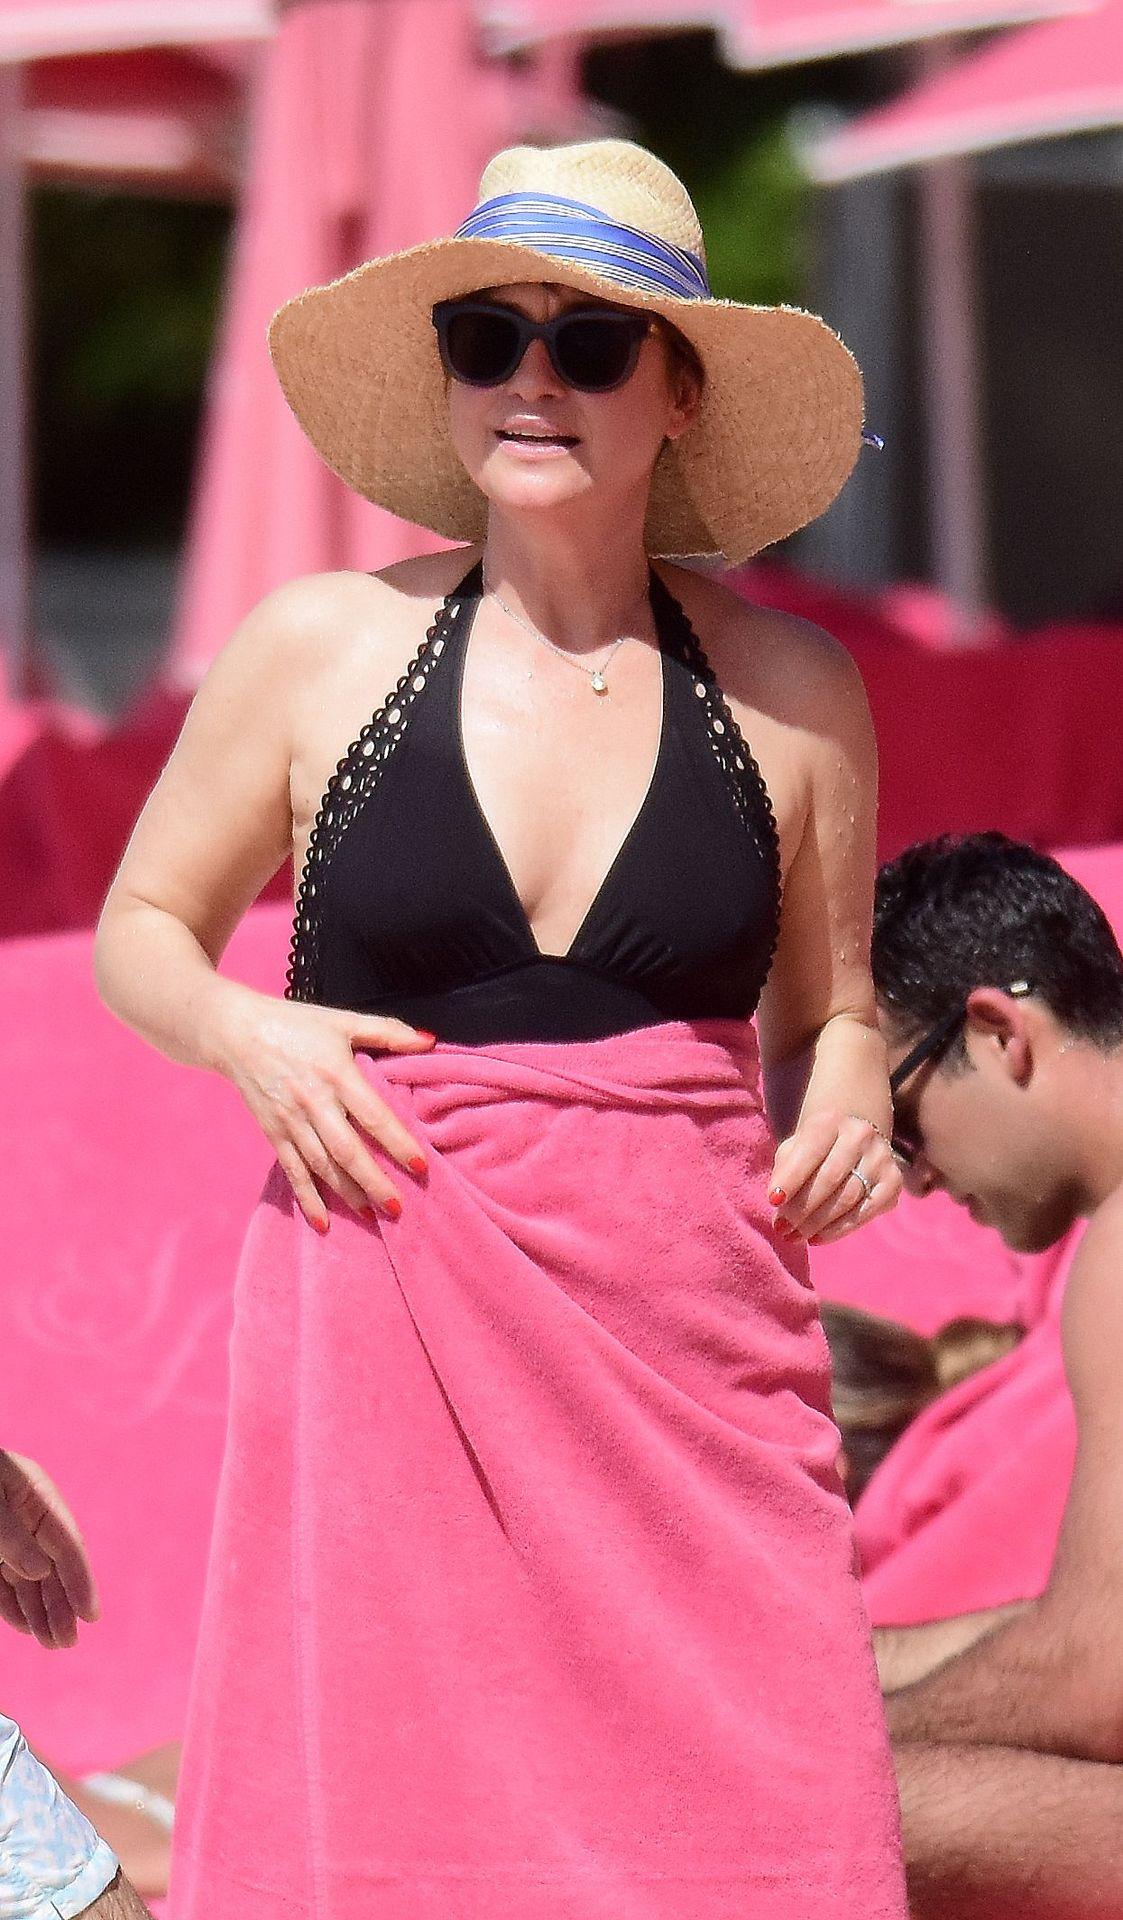 Emma Forbes Hot (70 Photos) 67